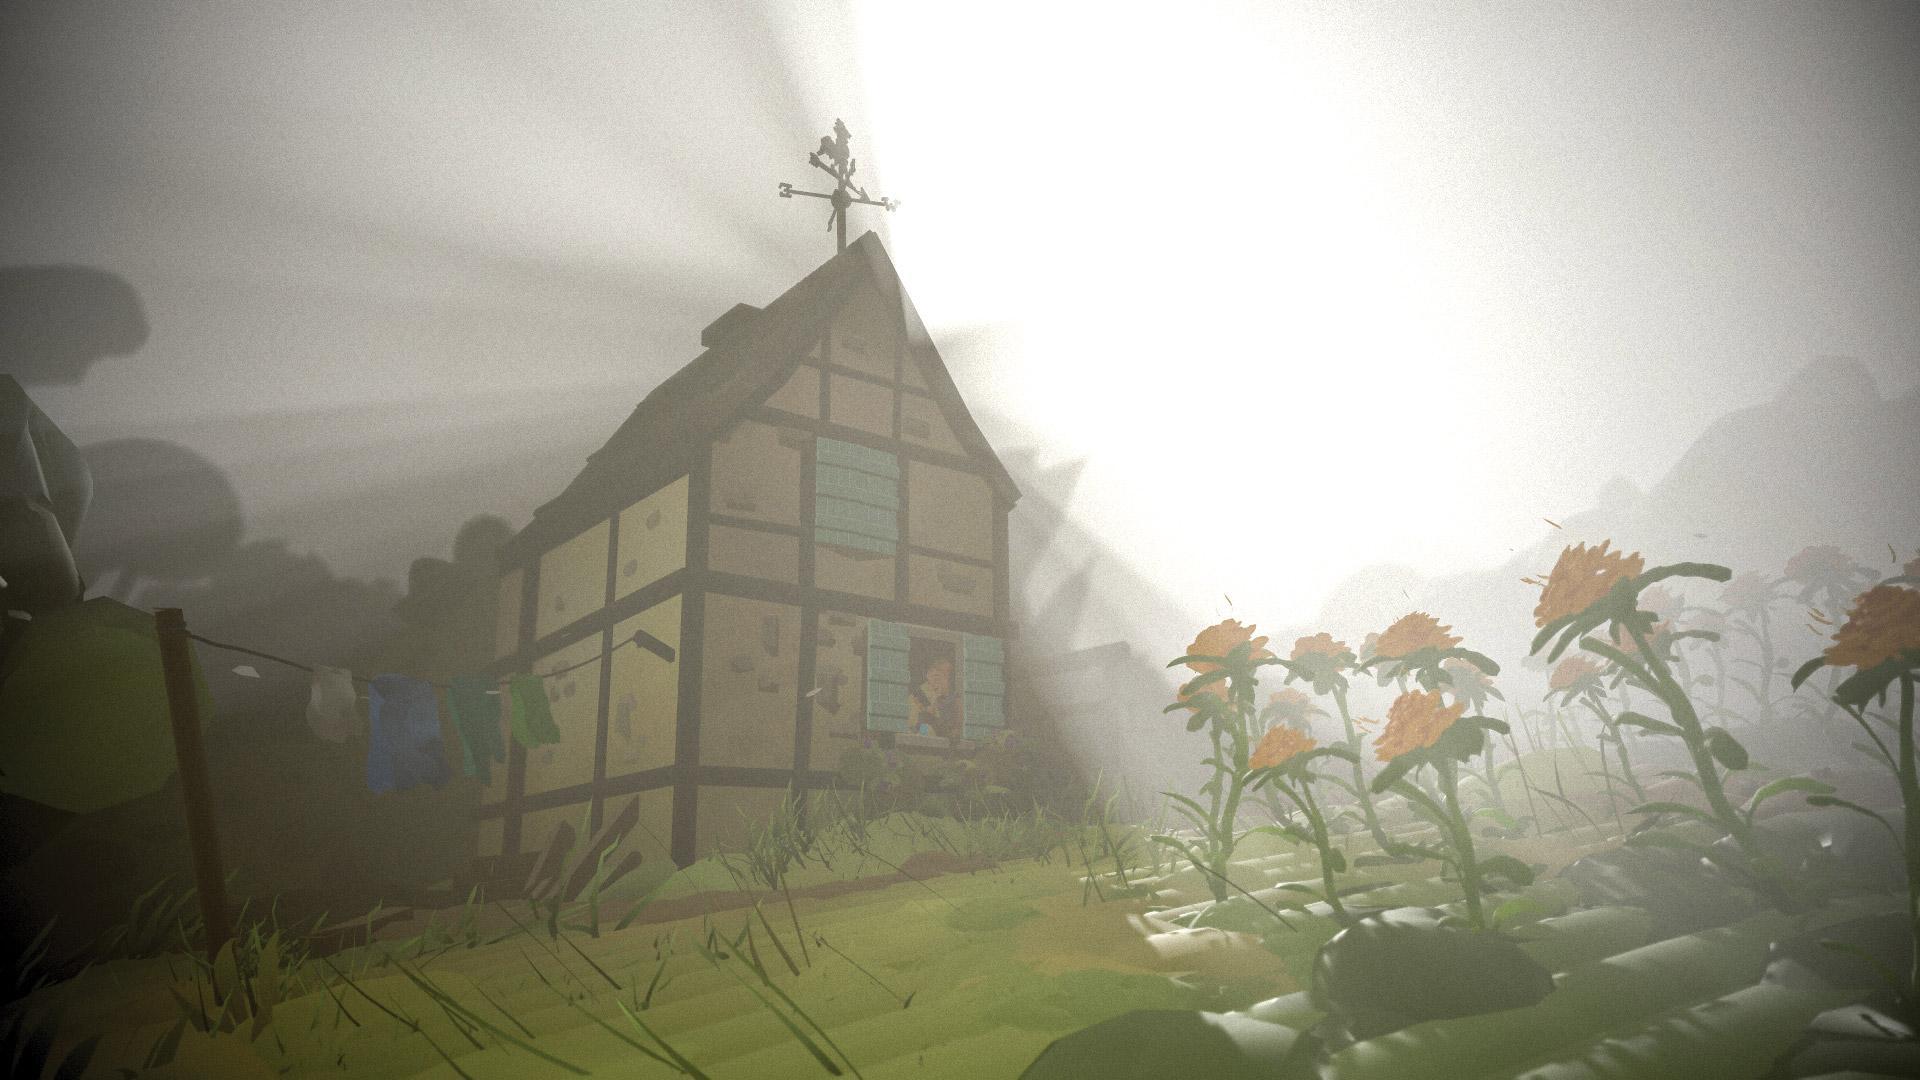 Rural barn scene with added fog